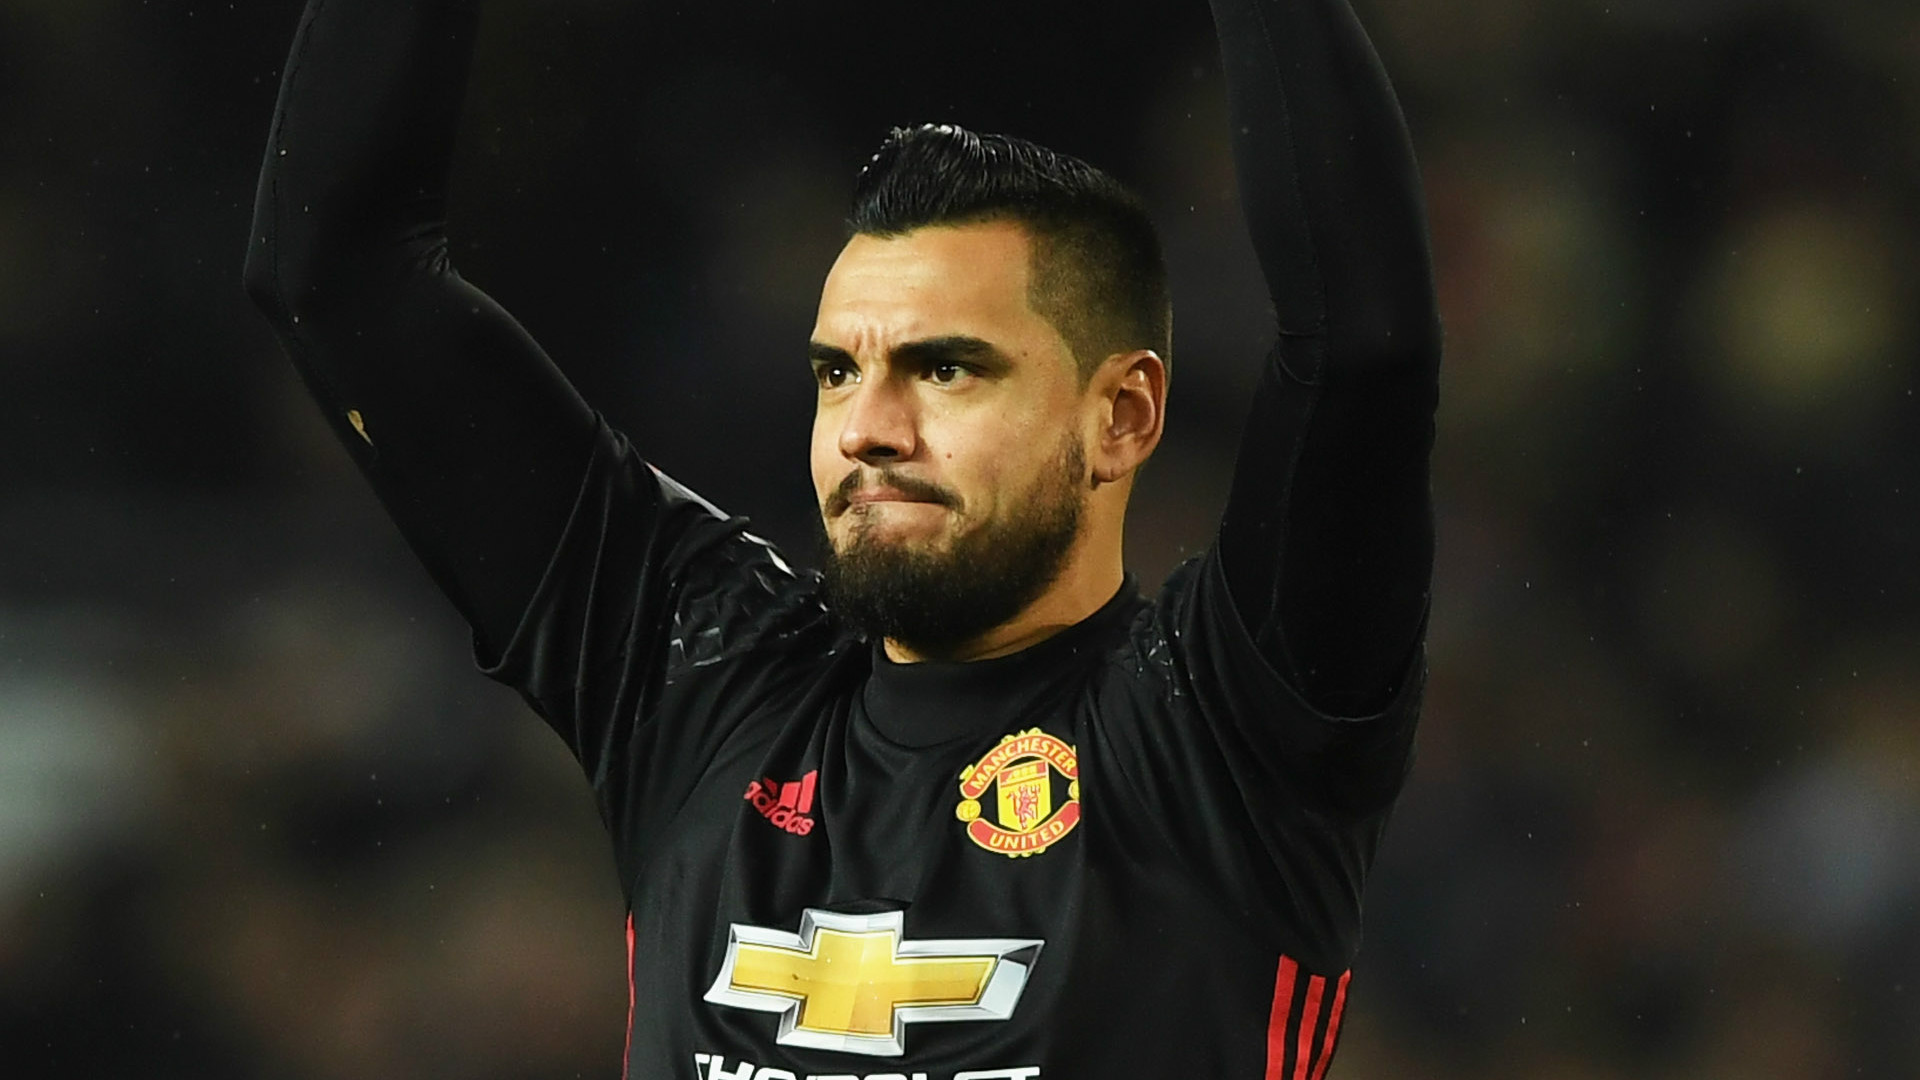 Maillot Extérieur Manchester United Sergio Romero